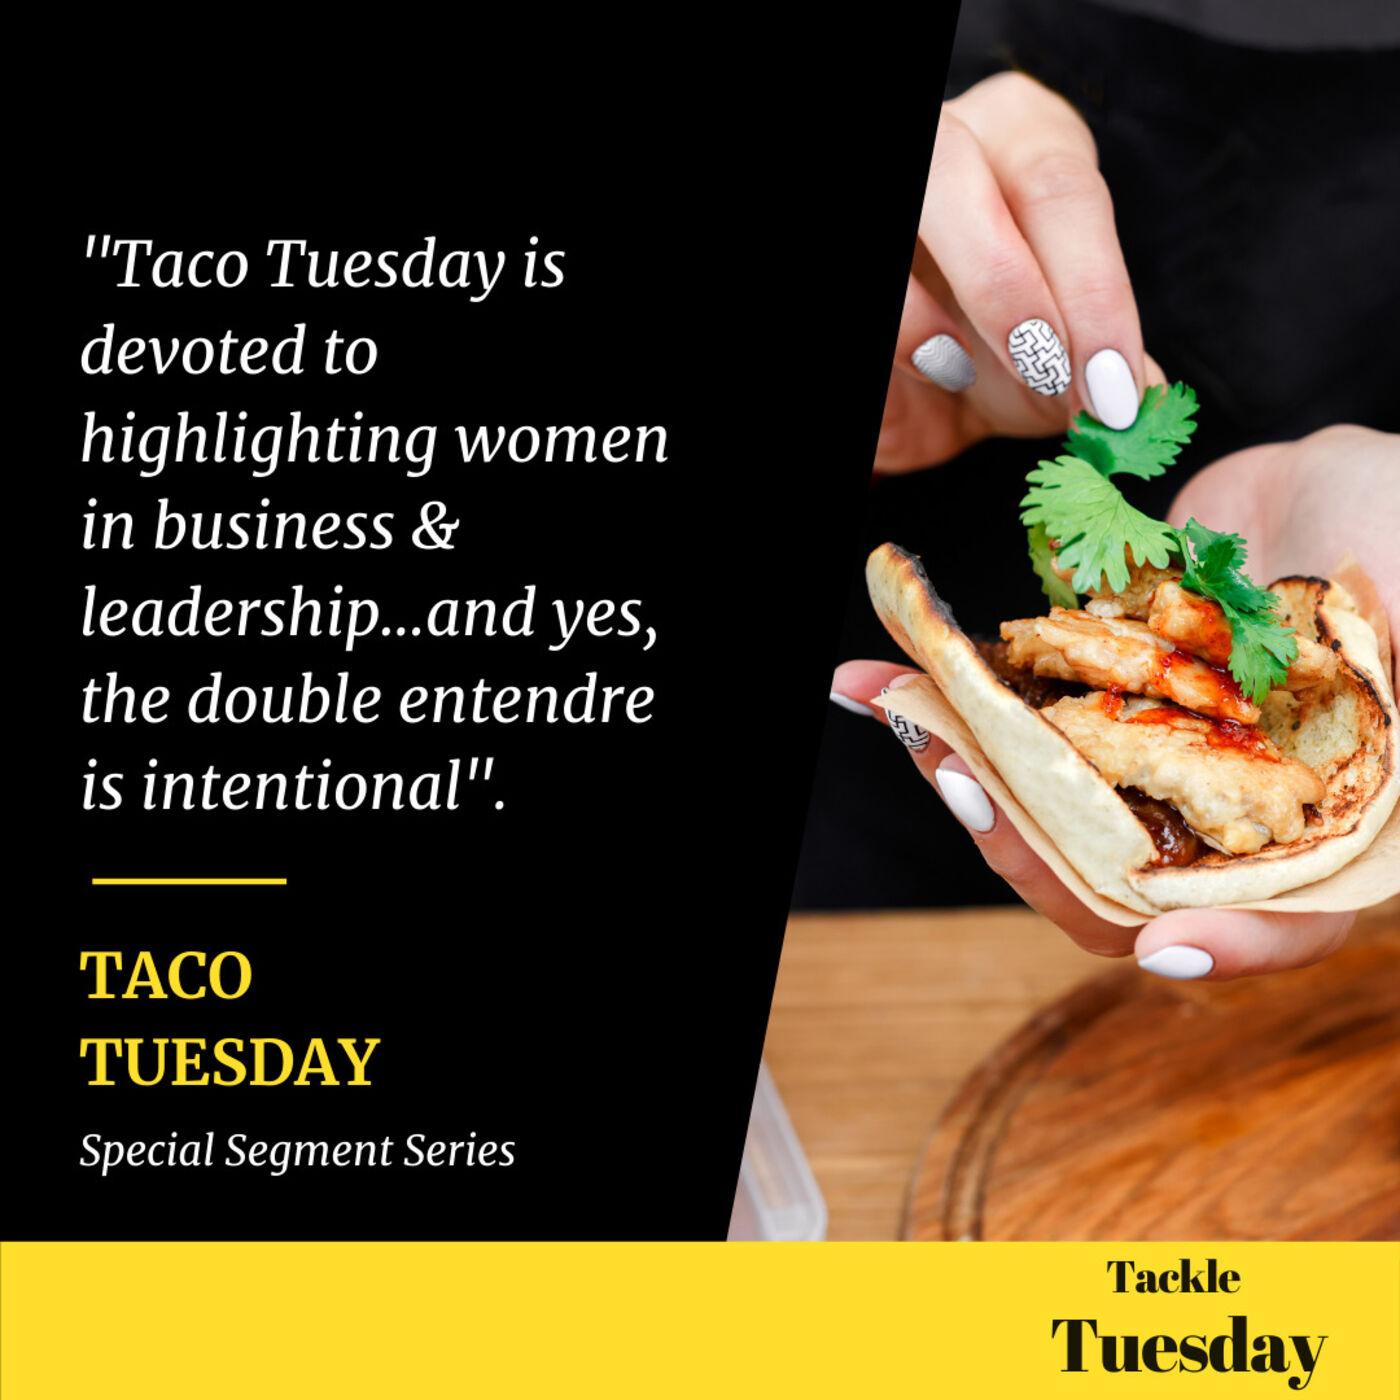 Taco Tuesday   Special Segment Series Trailer